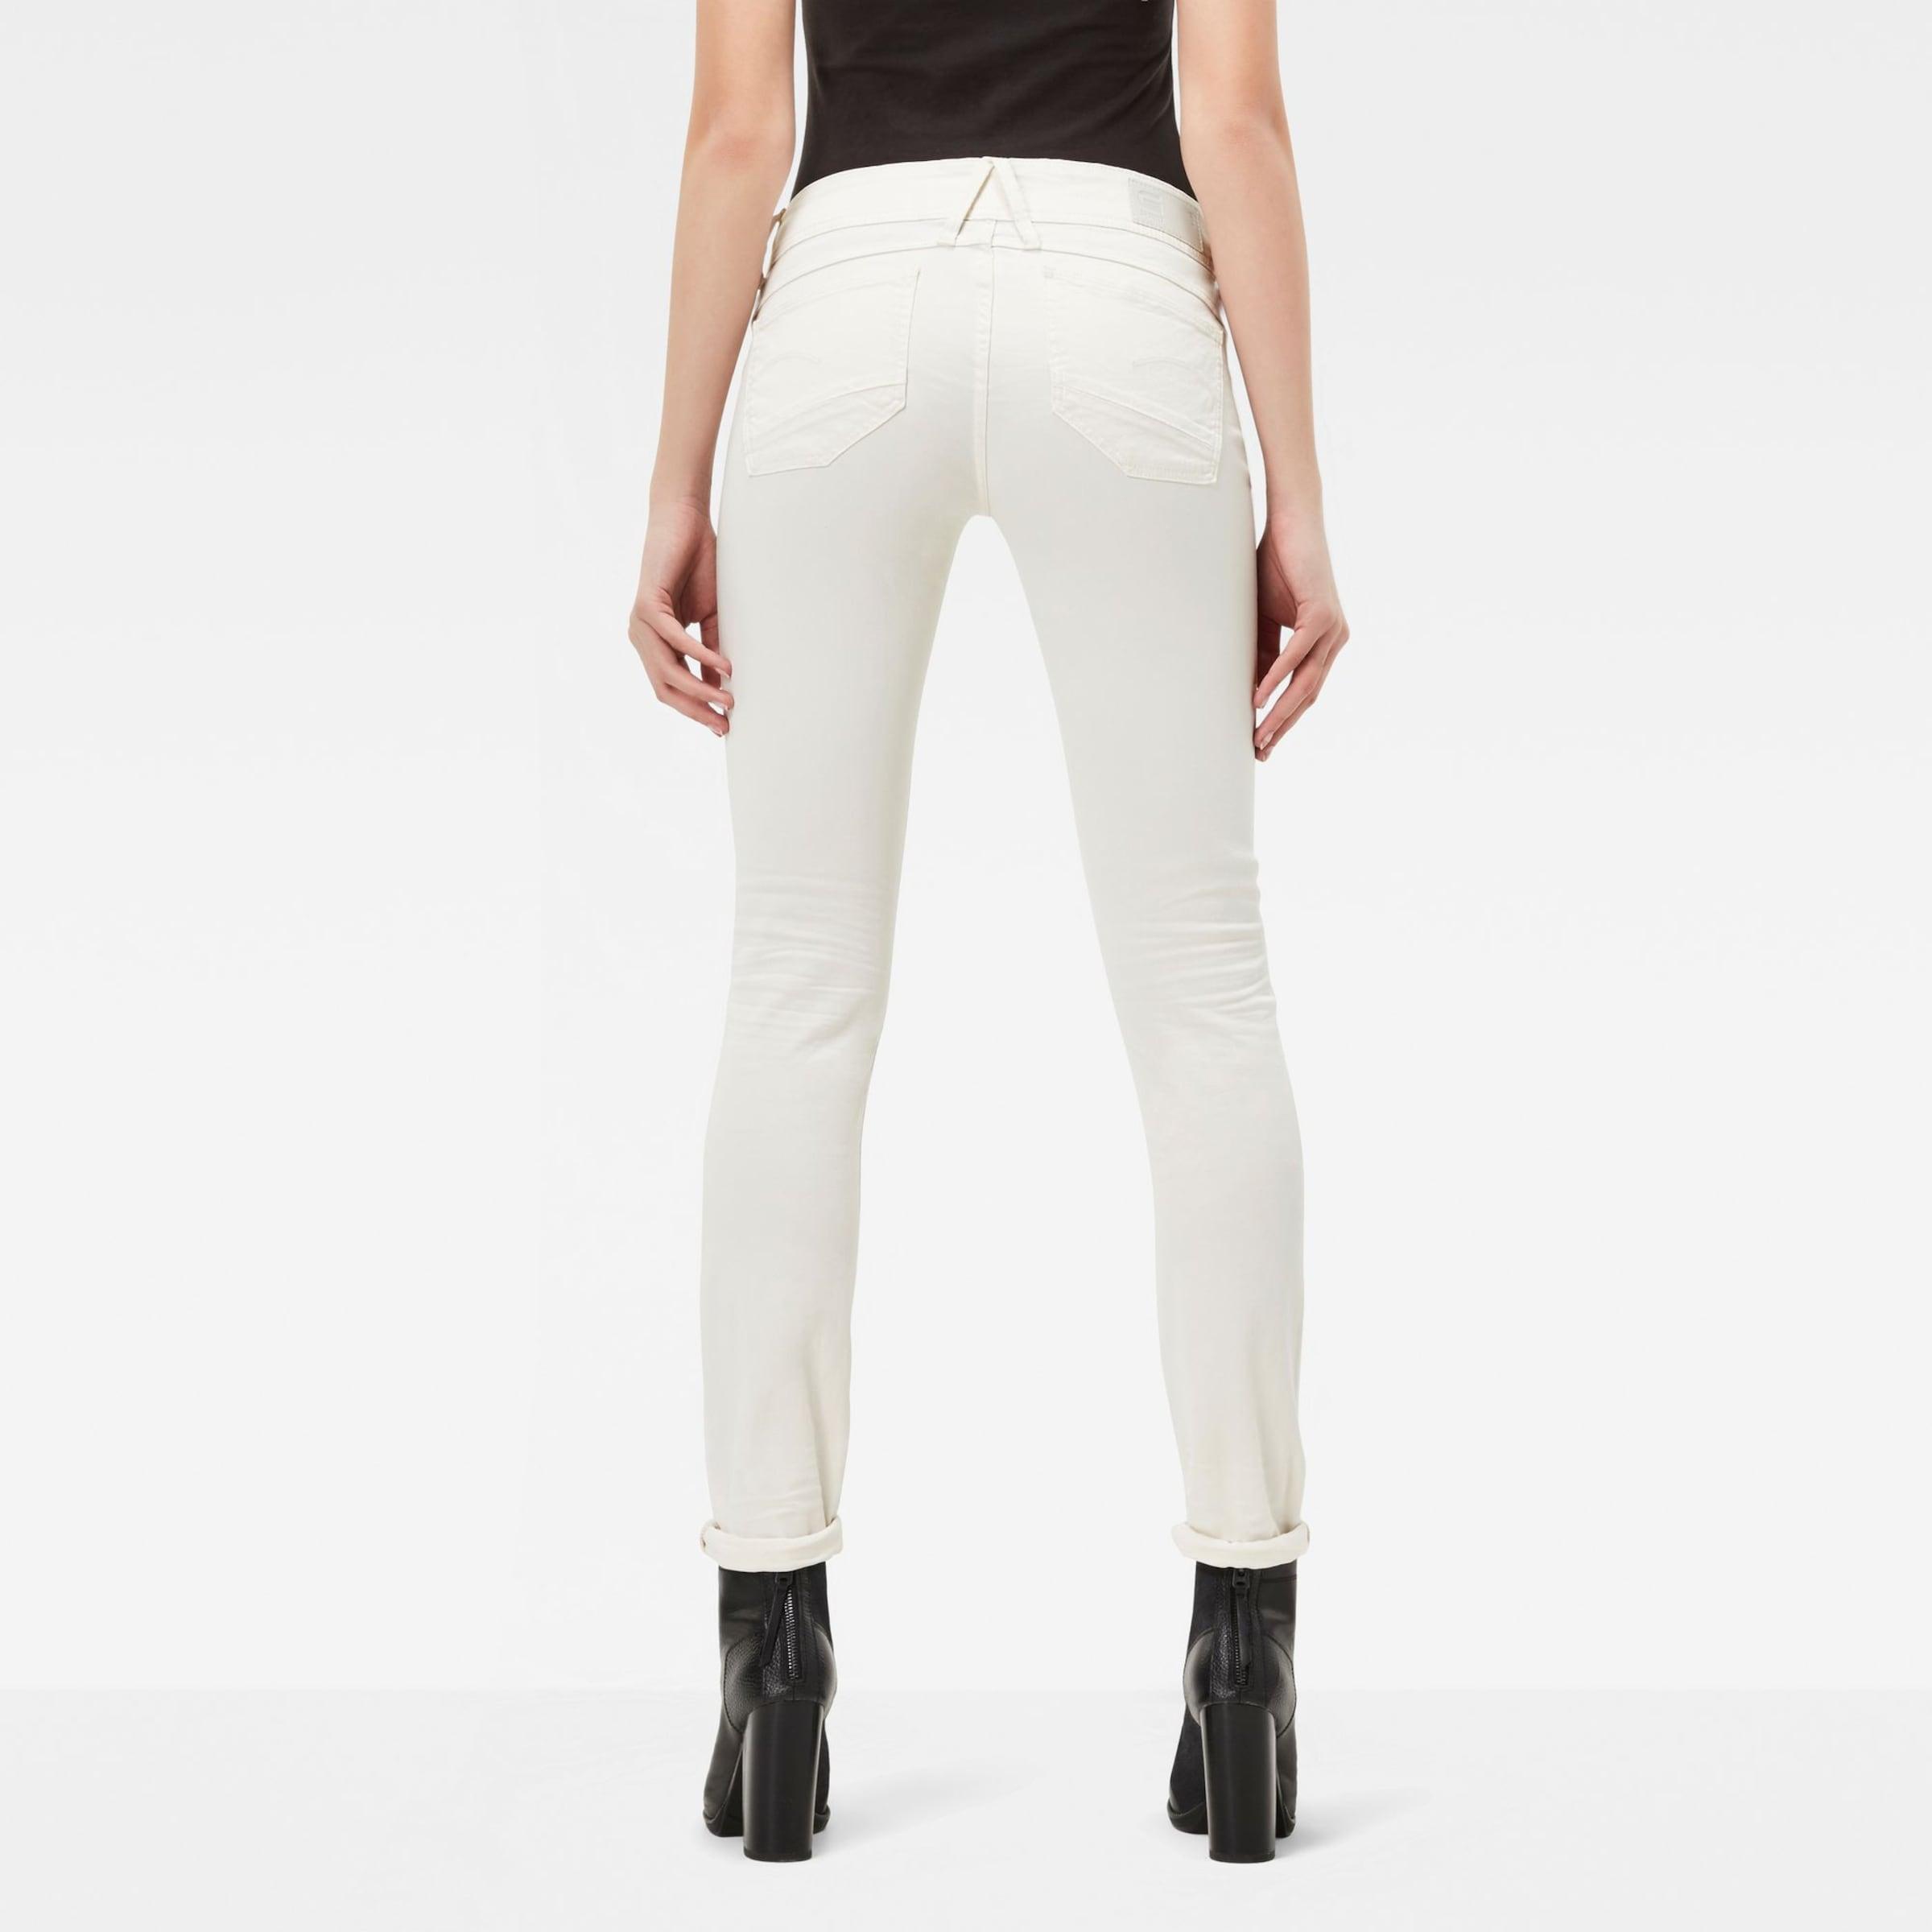 G-STAR RAW Skinny Jeans 'Lynn' Fabrikverkauf Rabatt-Shop Für Beliebt Und Billig AWVCxo8